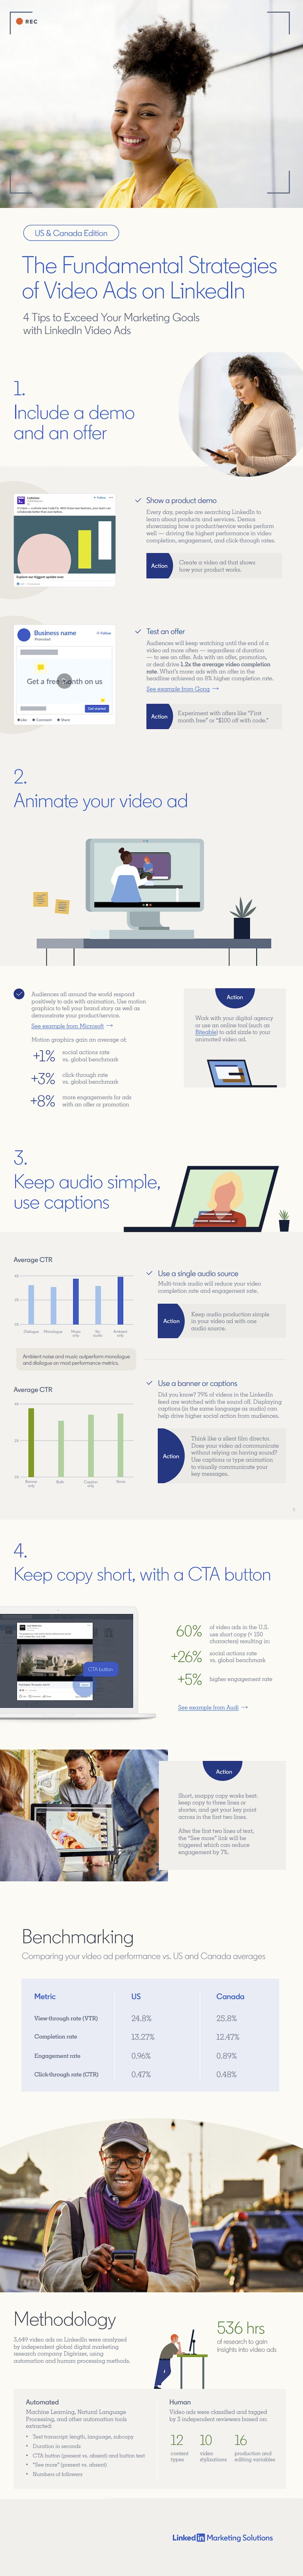 Four Tips for Better Videos Ads on LinkedIn